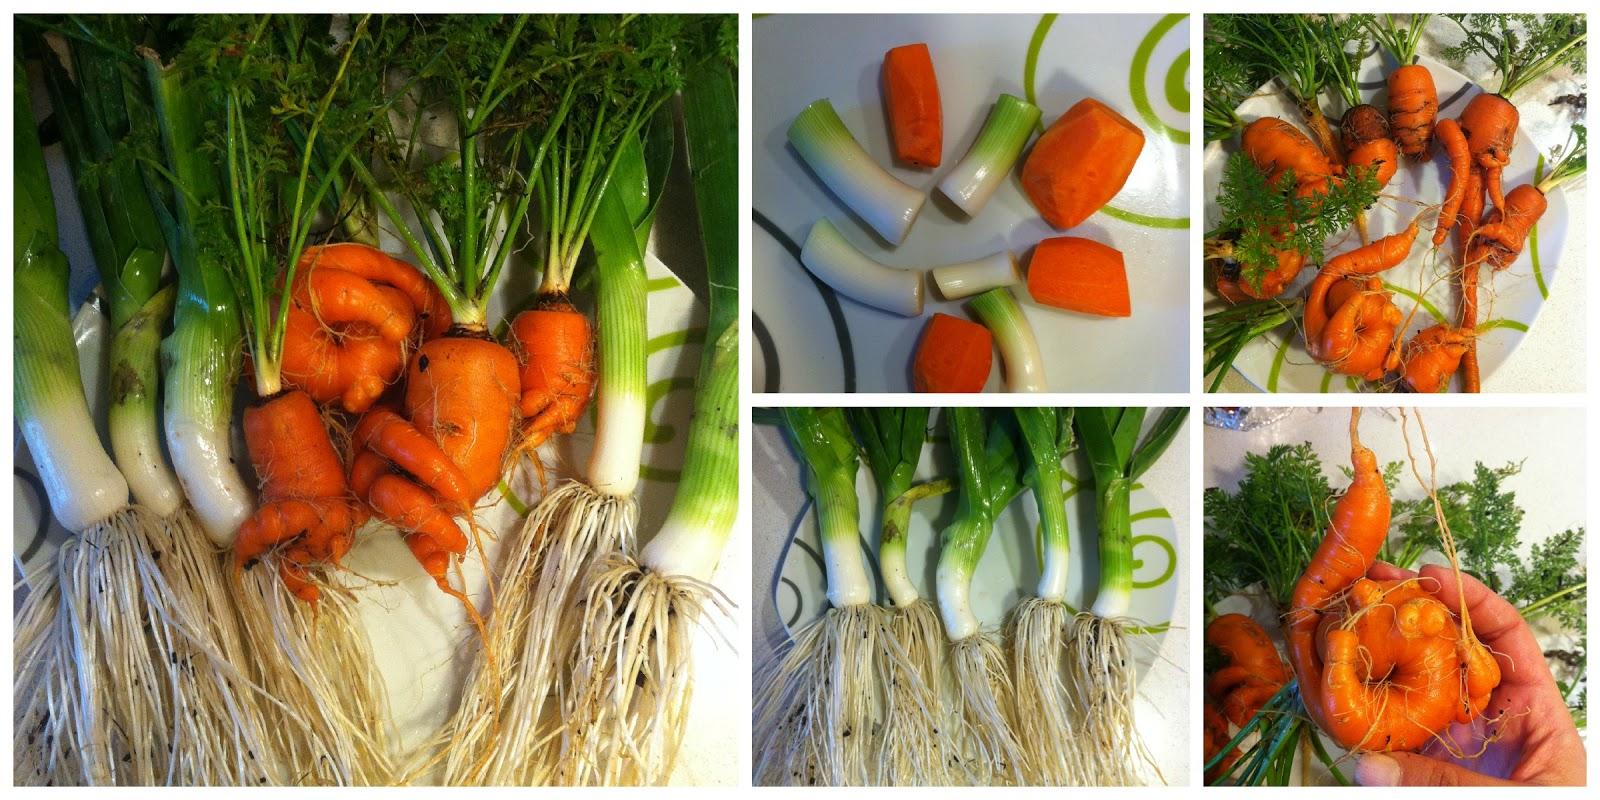 Bachi 4 chica zanahoria